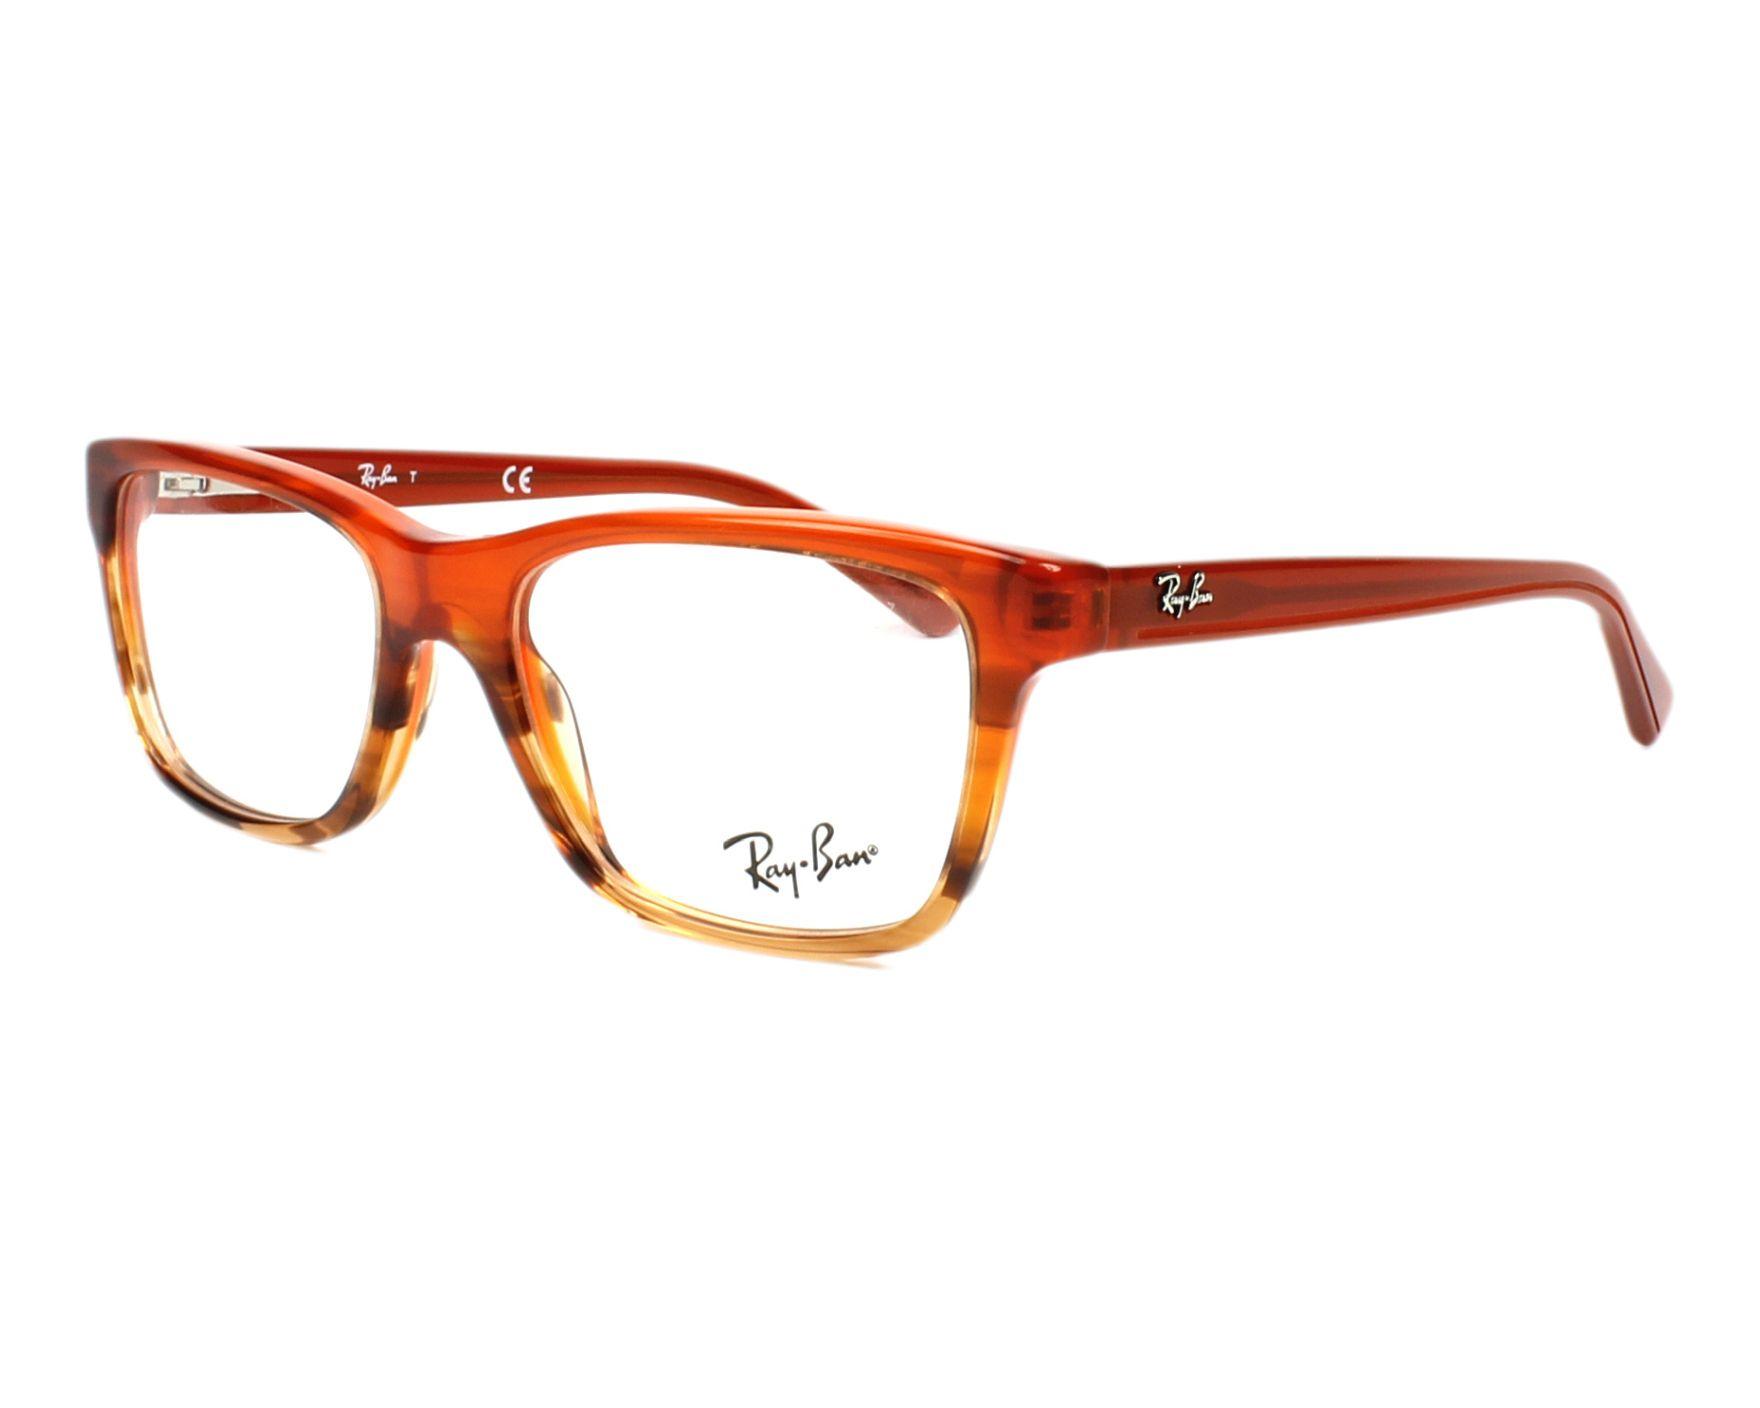 f1c8fd1761b416 Brillen Ray-Ban RY-1536 3732 48-16 braun braun Profilansicht